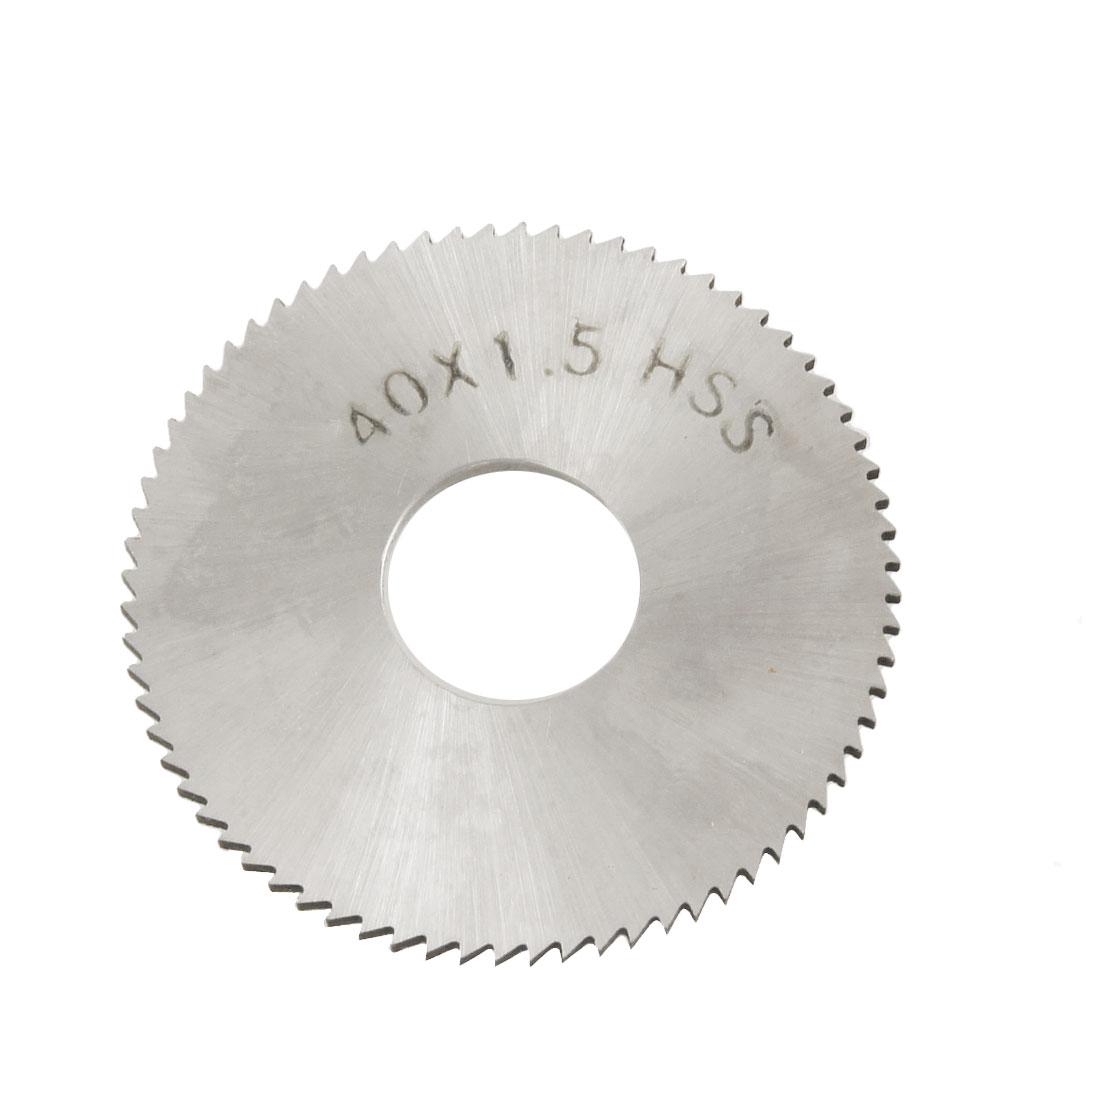 40mm x 1.5mm x 13mm HSS 72T Slitting Saw Blade Cutting Tool